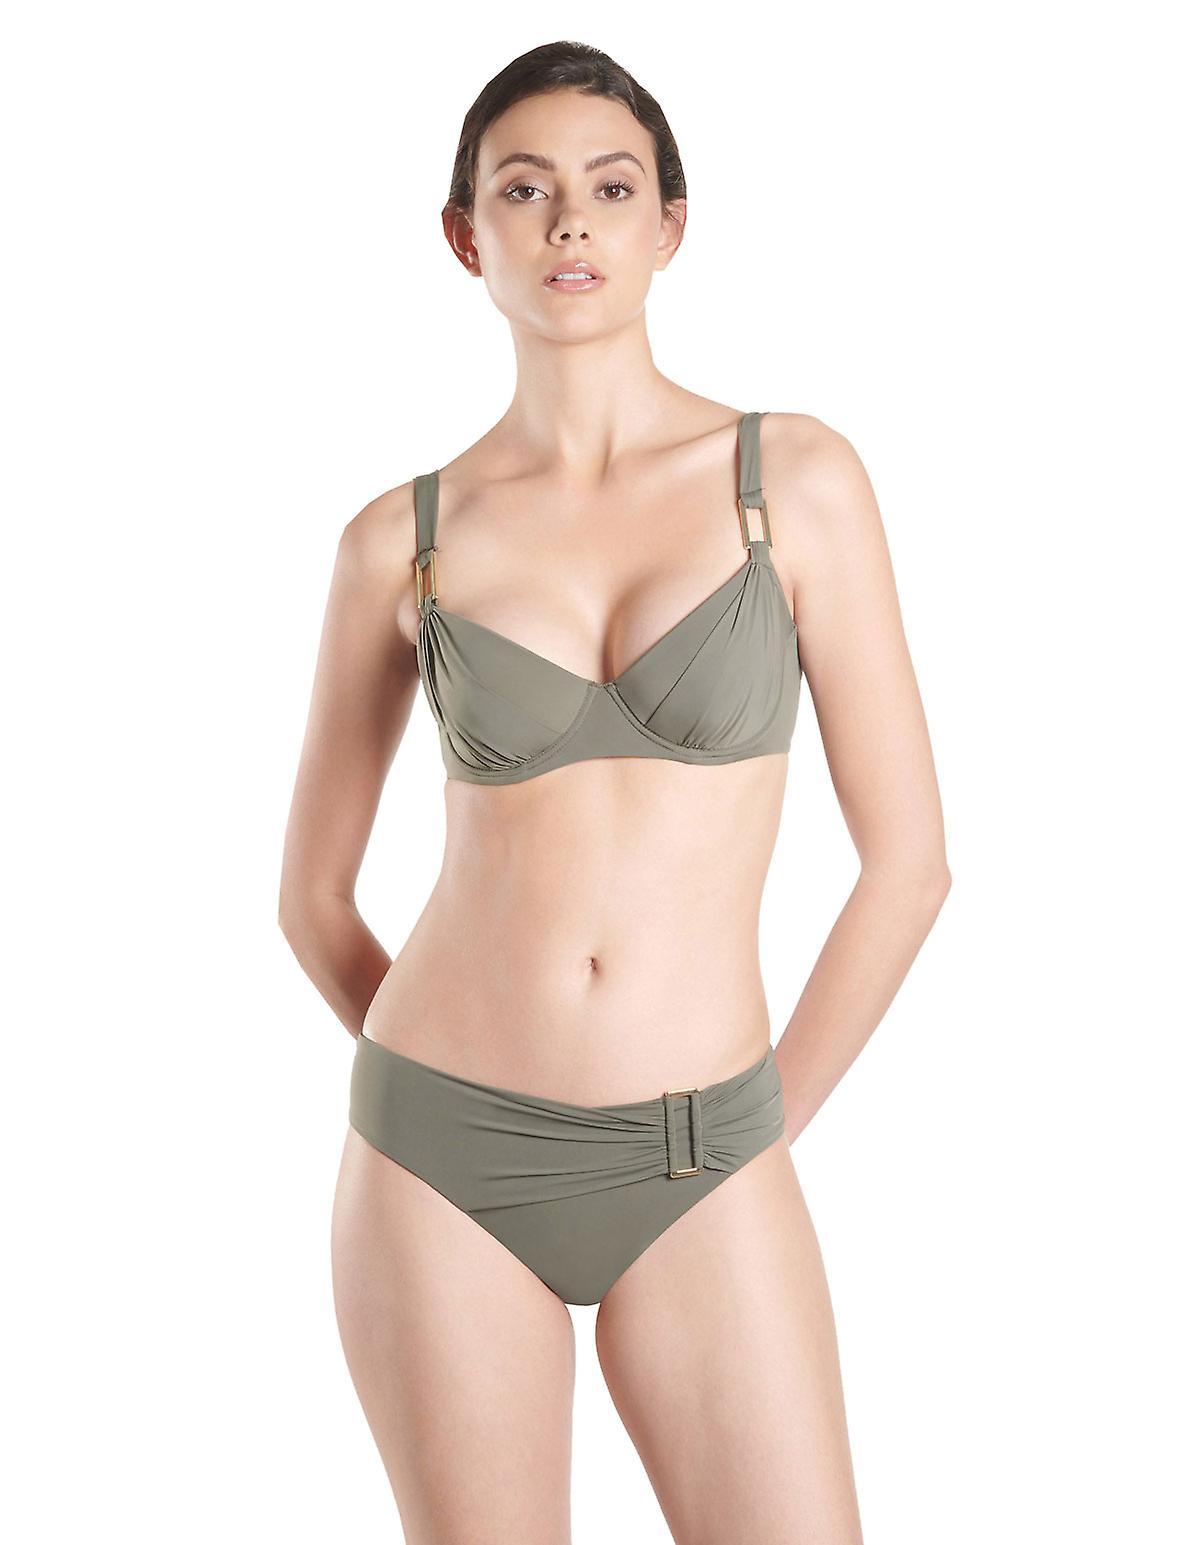 Nv22 Women's Esprit Sauvage Brazilian Aubade Beachwear Swimwear Bikini Bottom 4R5AjL